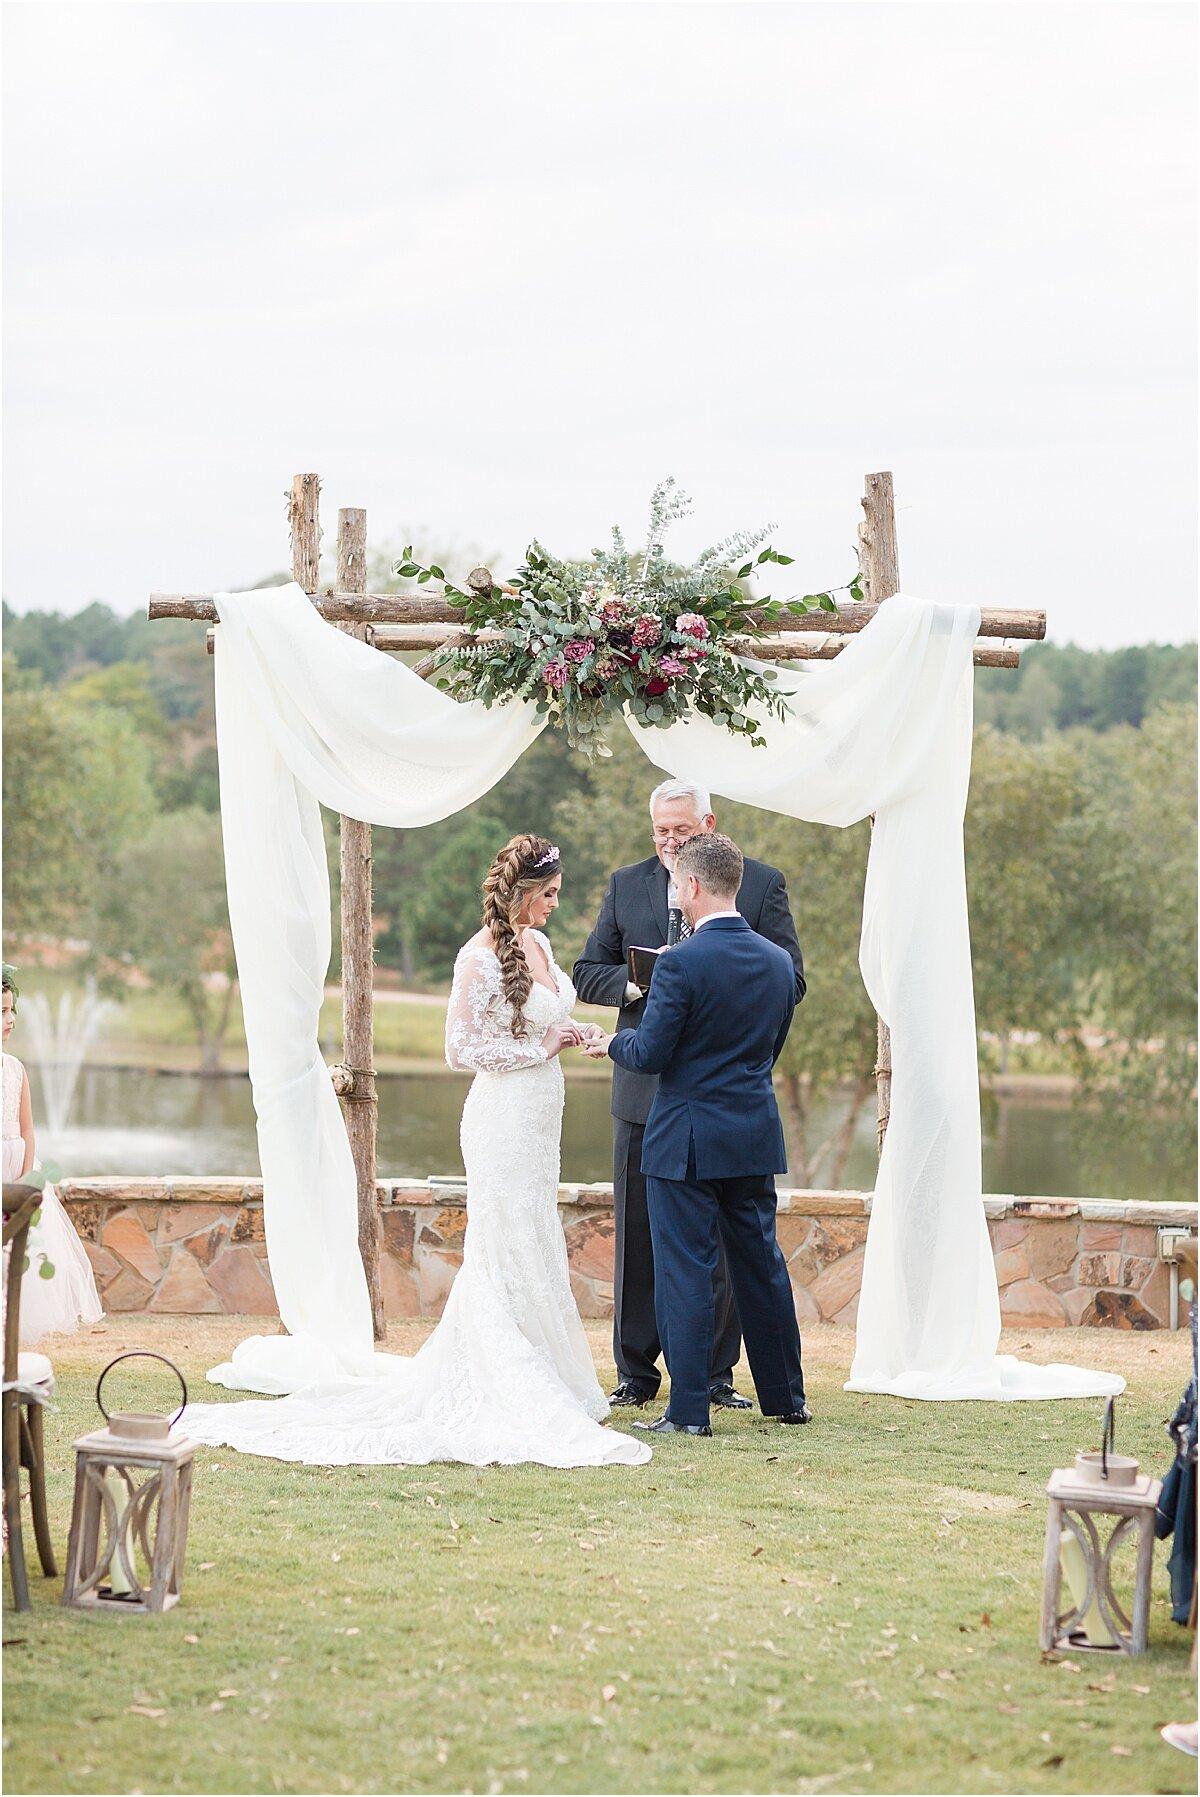 Jersey_Ga_Wedding_Venues_Holly_L_Robbins_Photography_0077.jpg